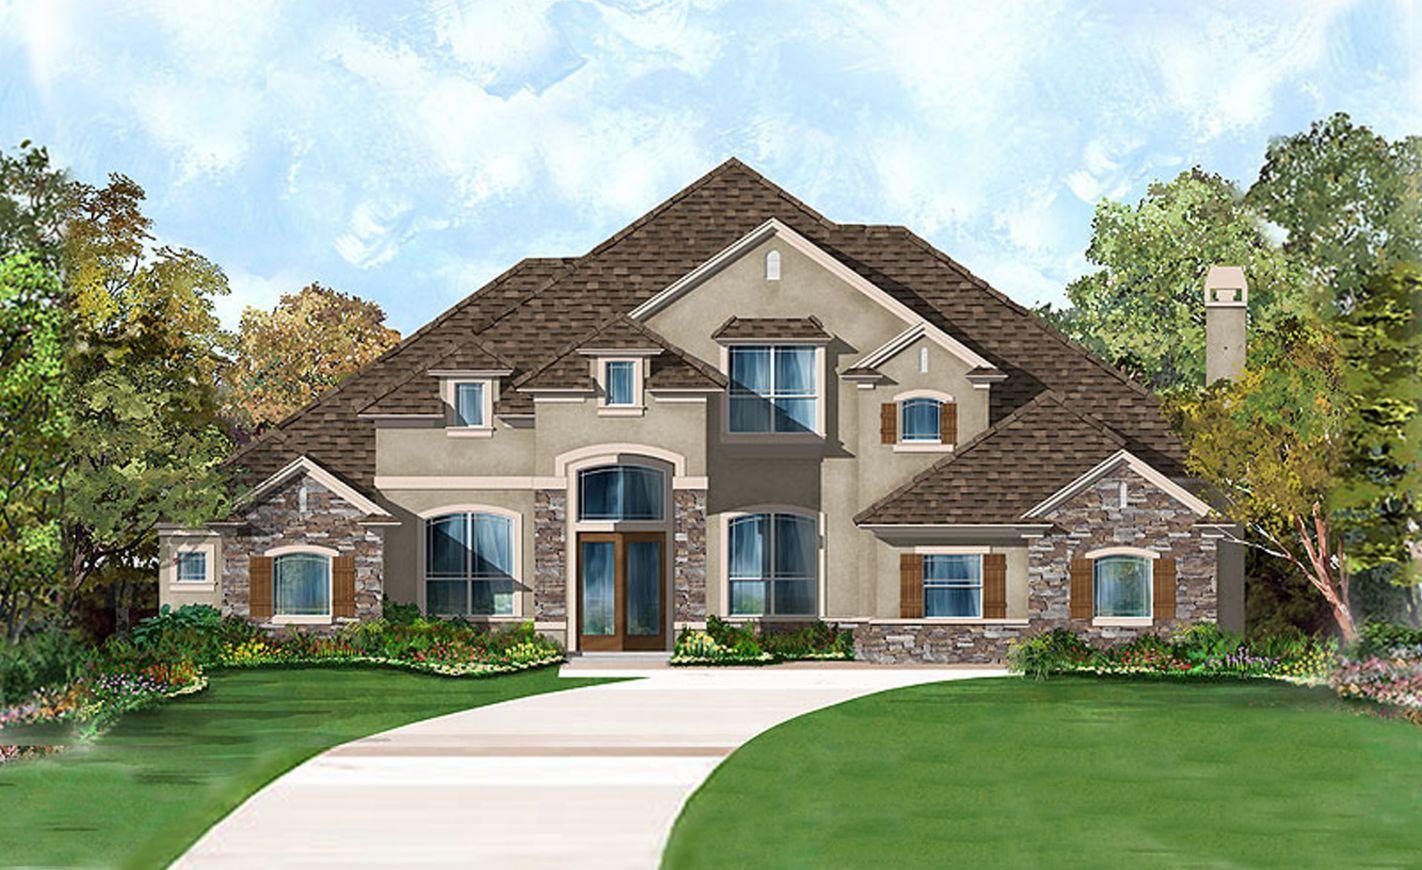 516 East Kesley Lane, Saint Johns, FL Homes & Land - Real Estate